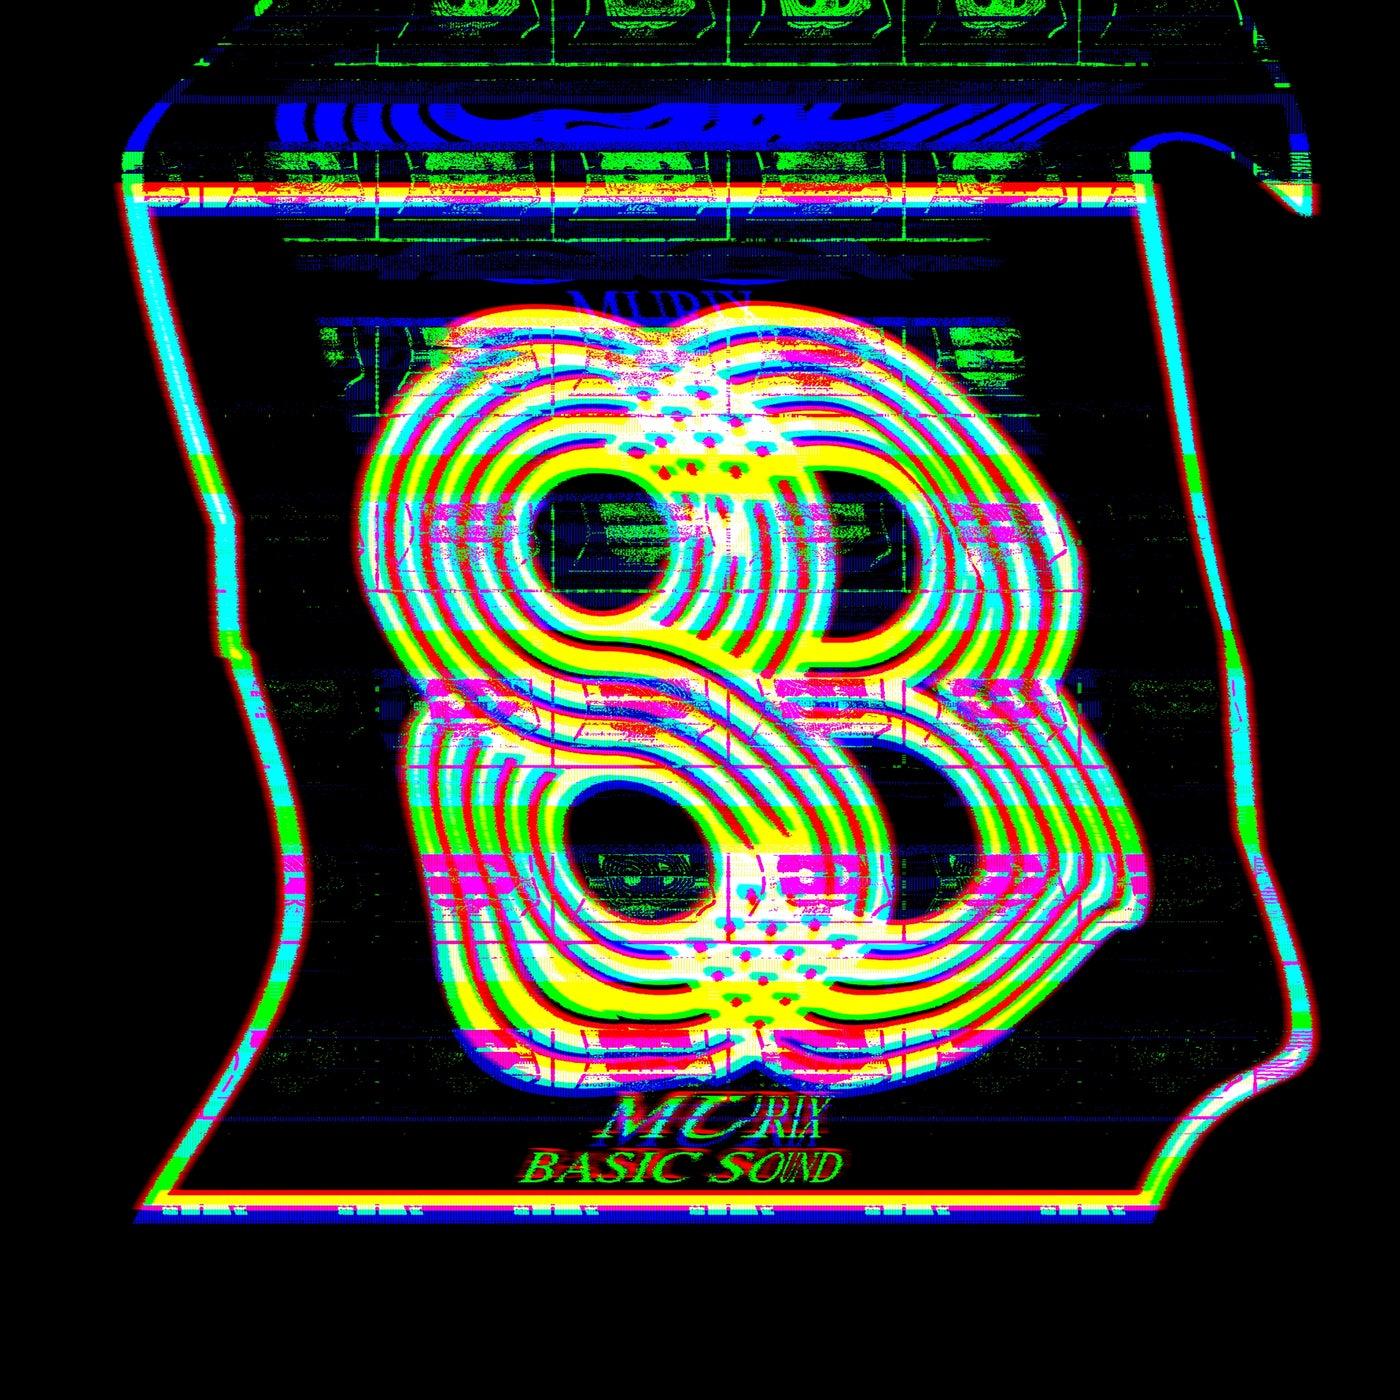 Basic Sound (Original Mix)